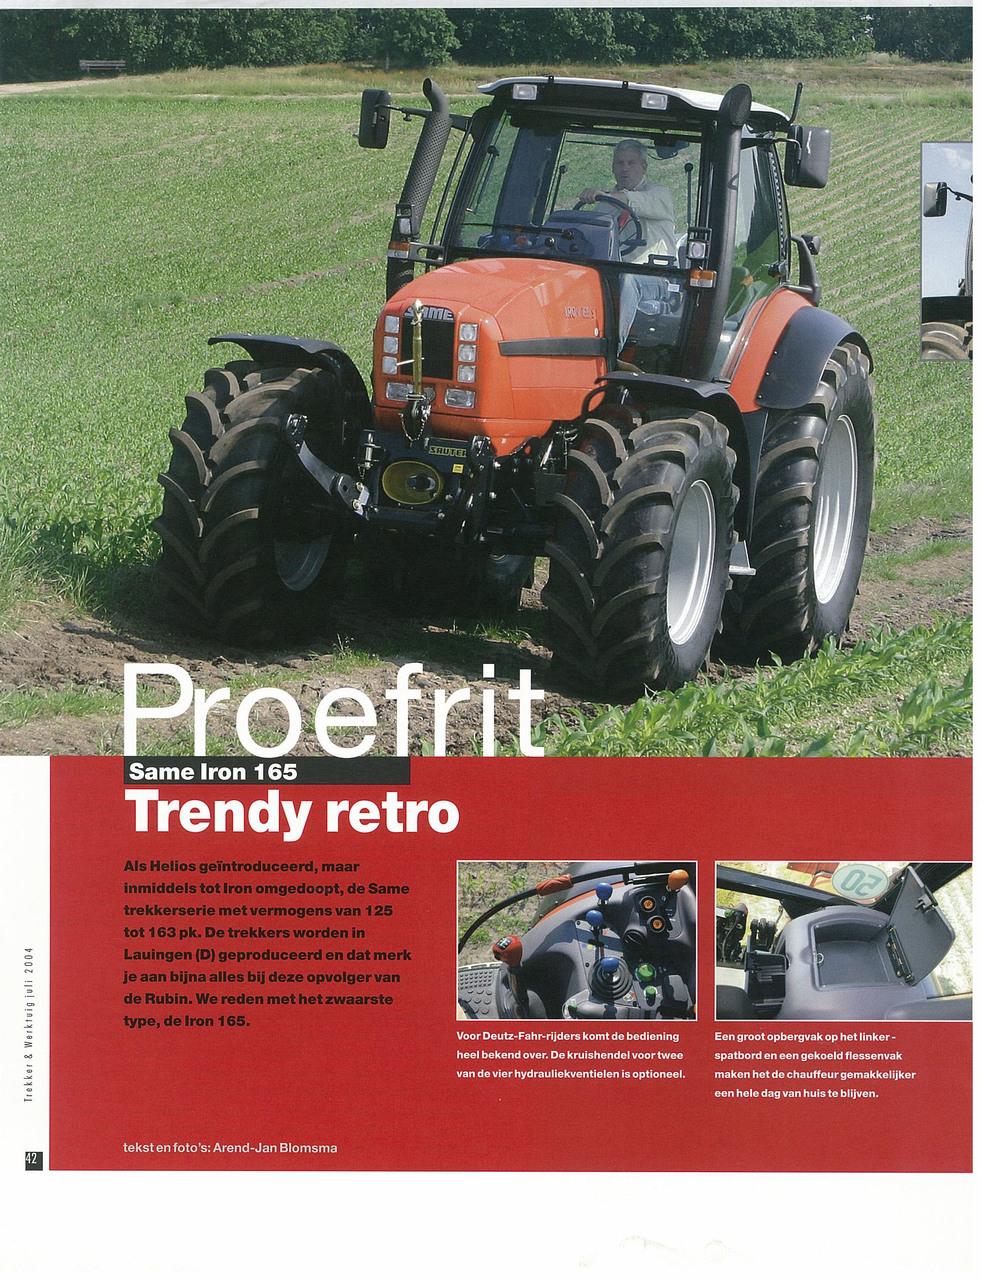 Proefrit: SAME Iron 165. Trendy retro